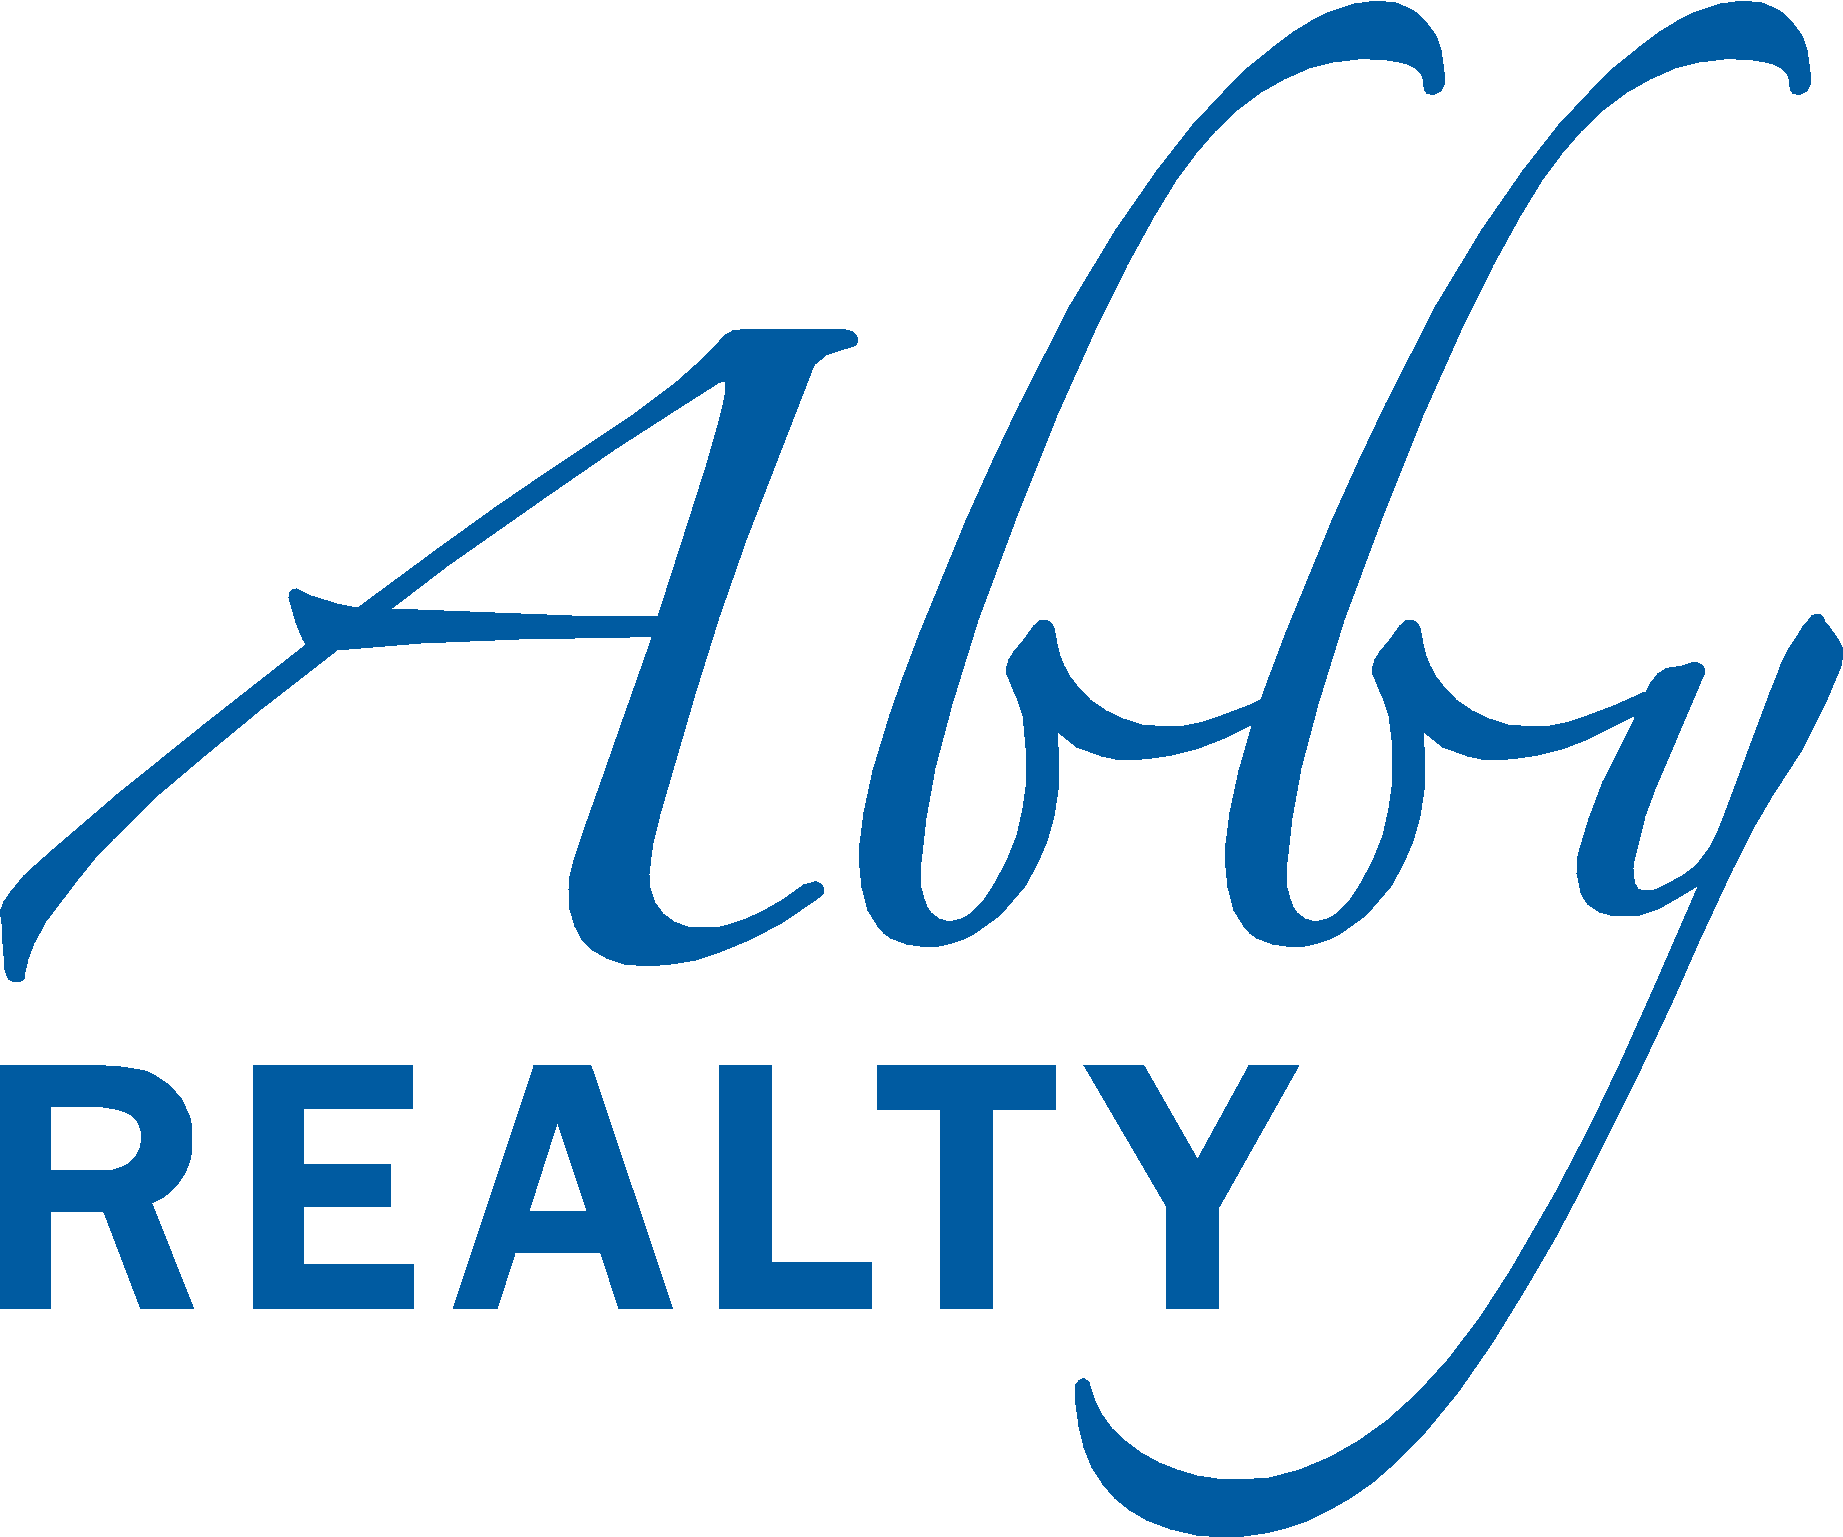 Abby Realty